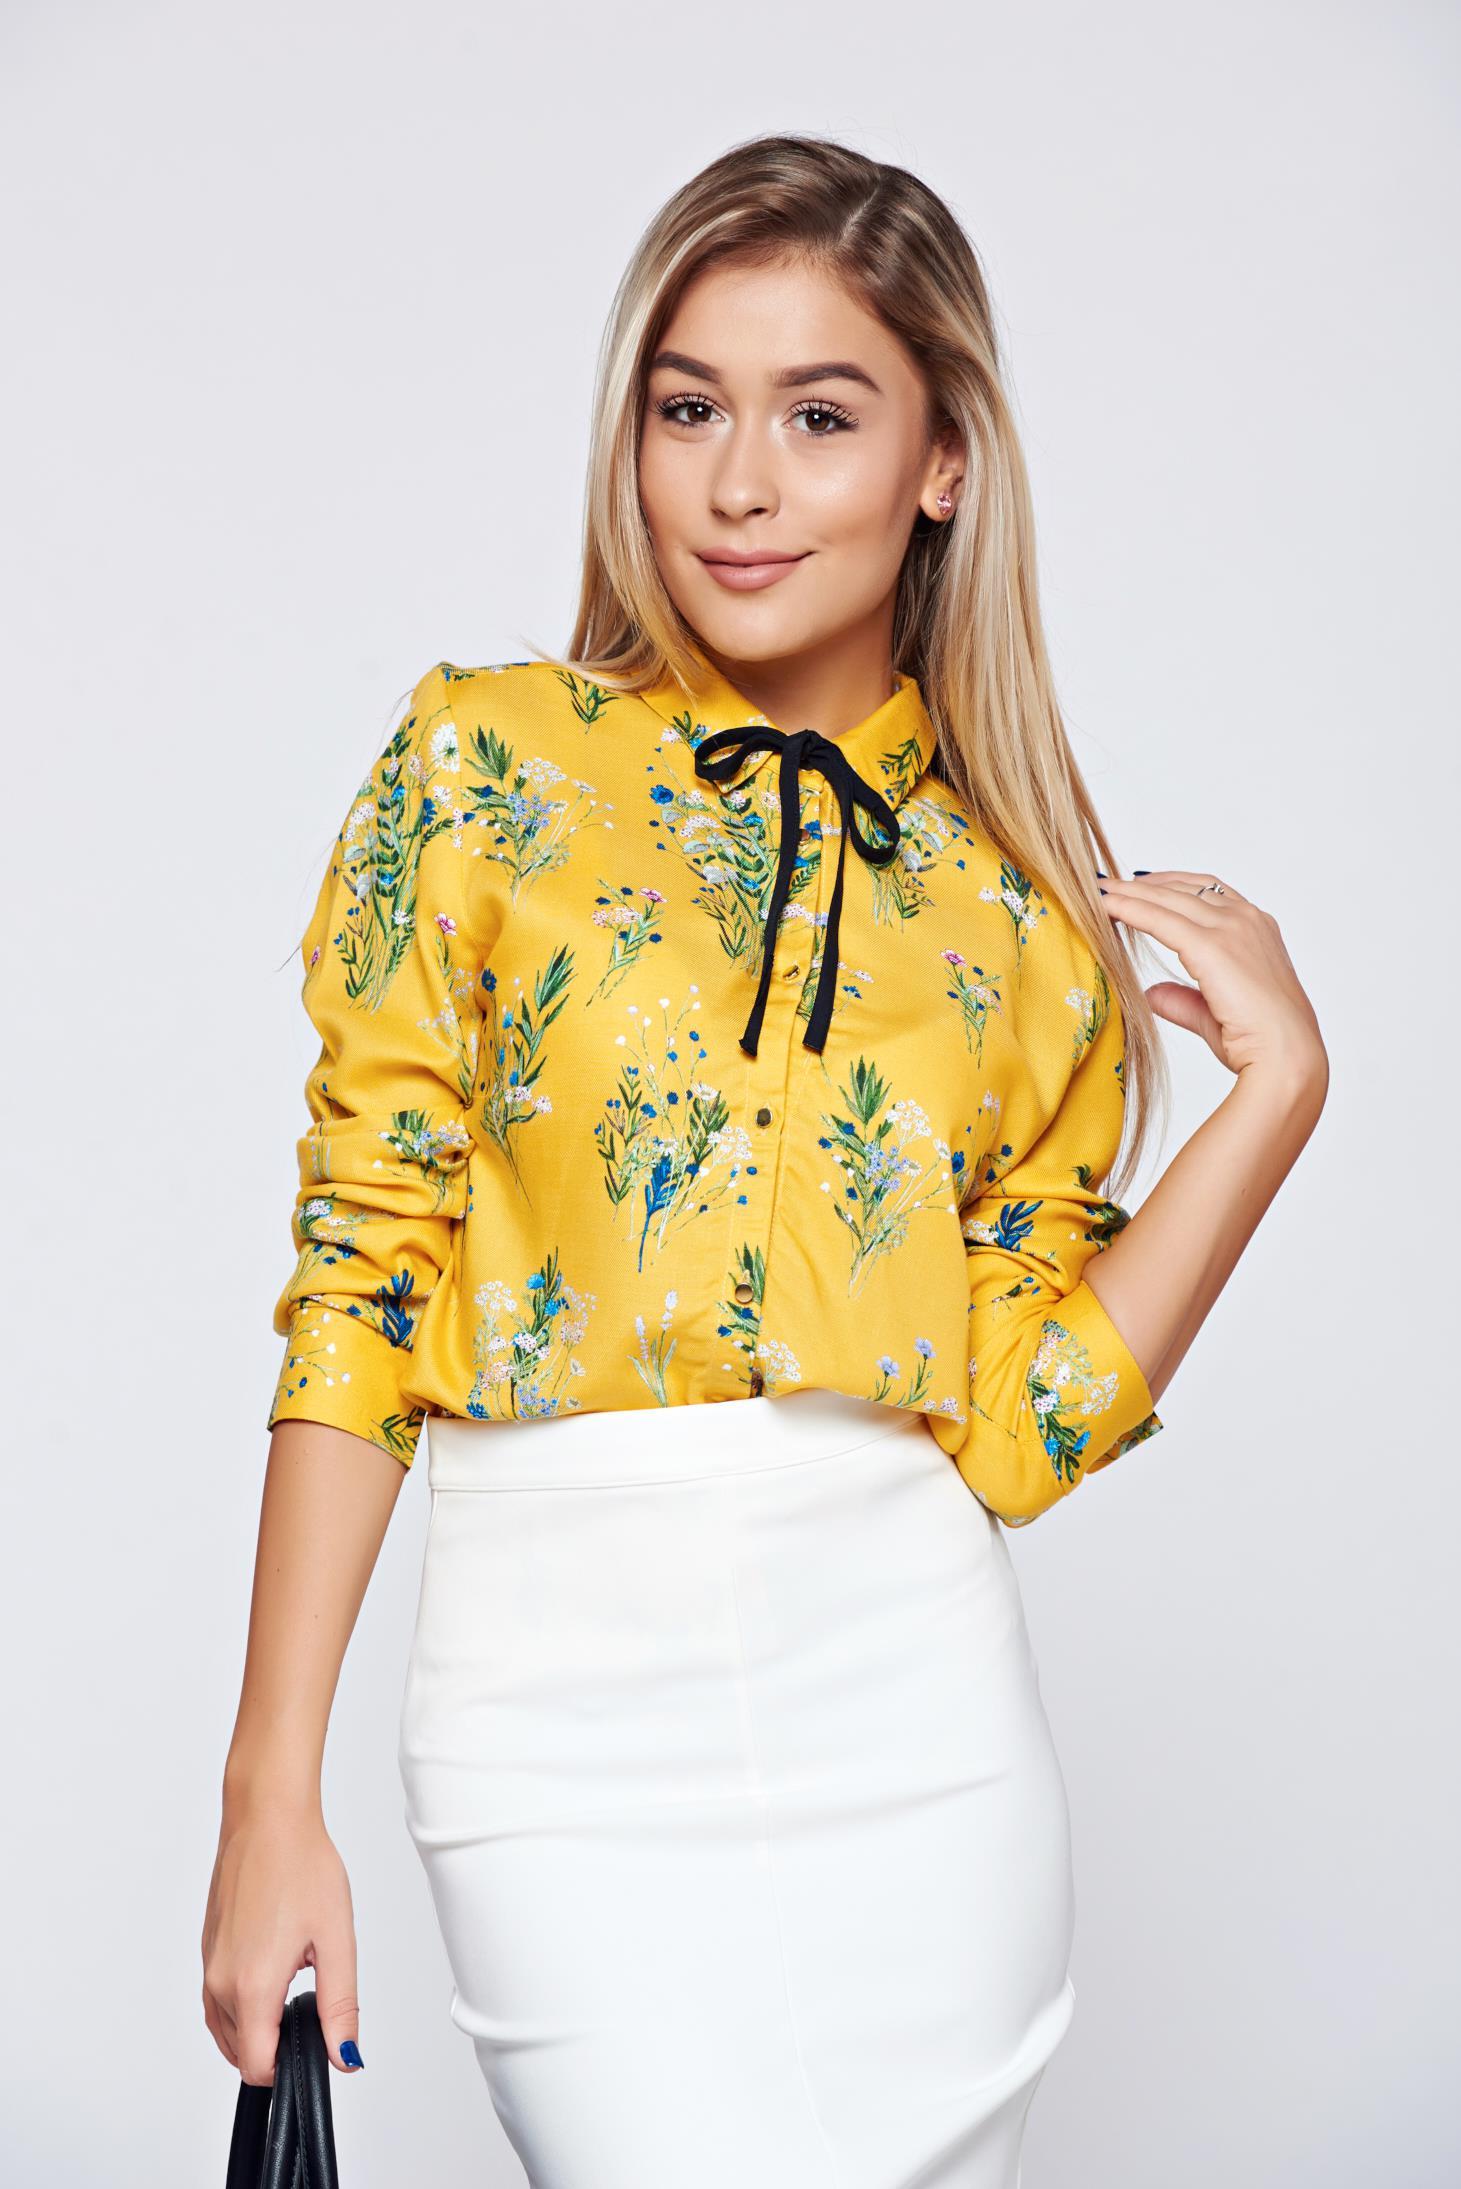 Camasi dama elegante! Modele variate de camasi de dama online!